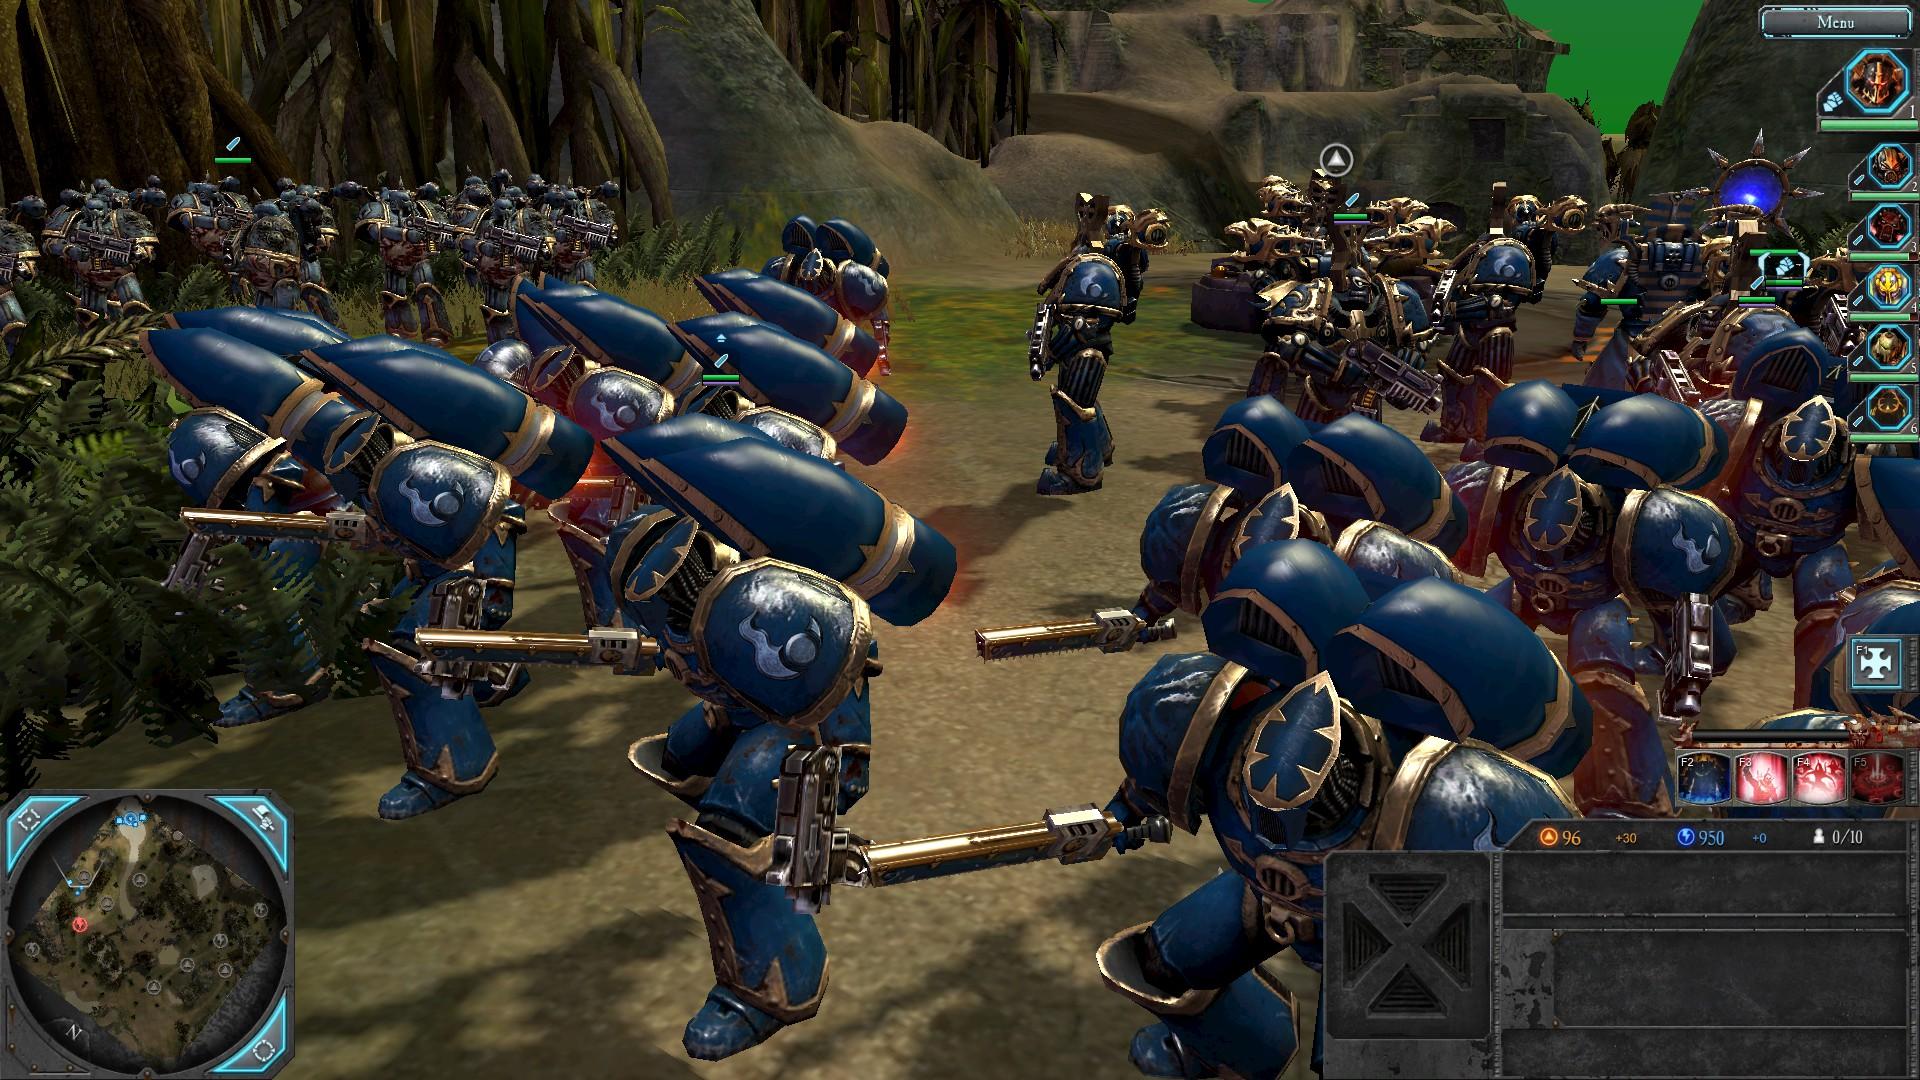 Total War Warhammer Wallpaper Hd Chaos Image Apocalypse Mod For Dawn Of War Ii